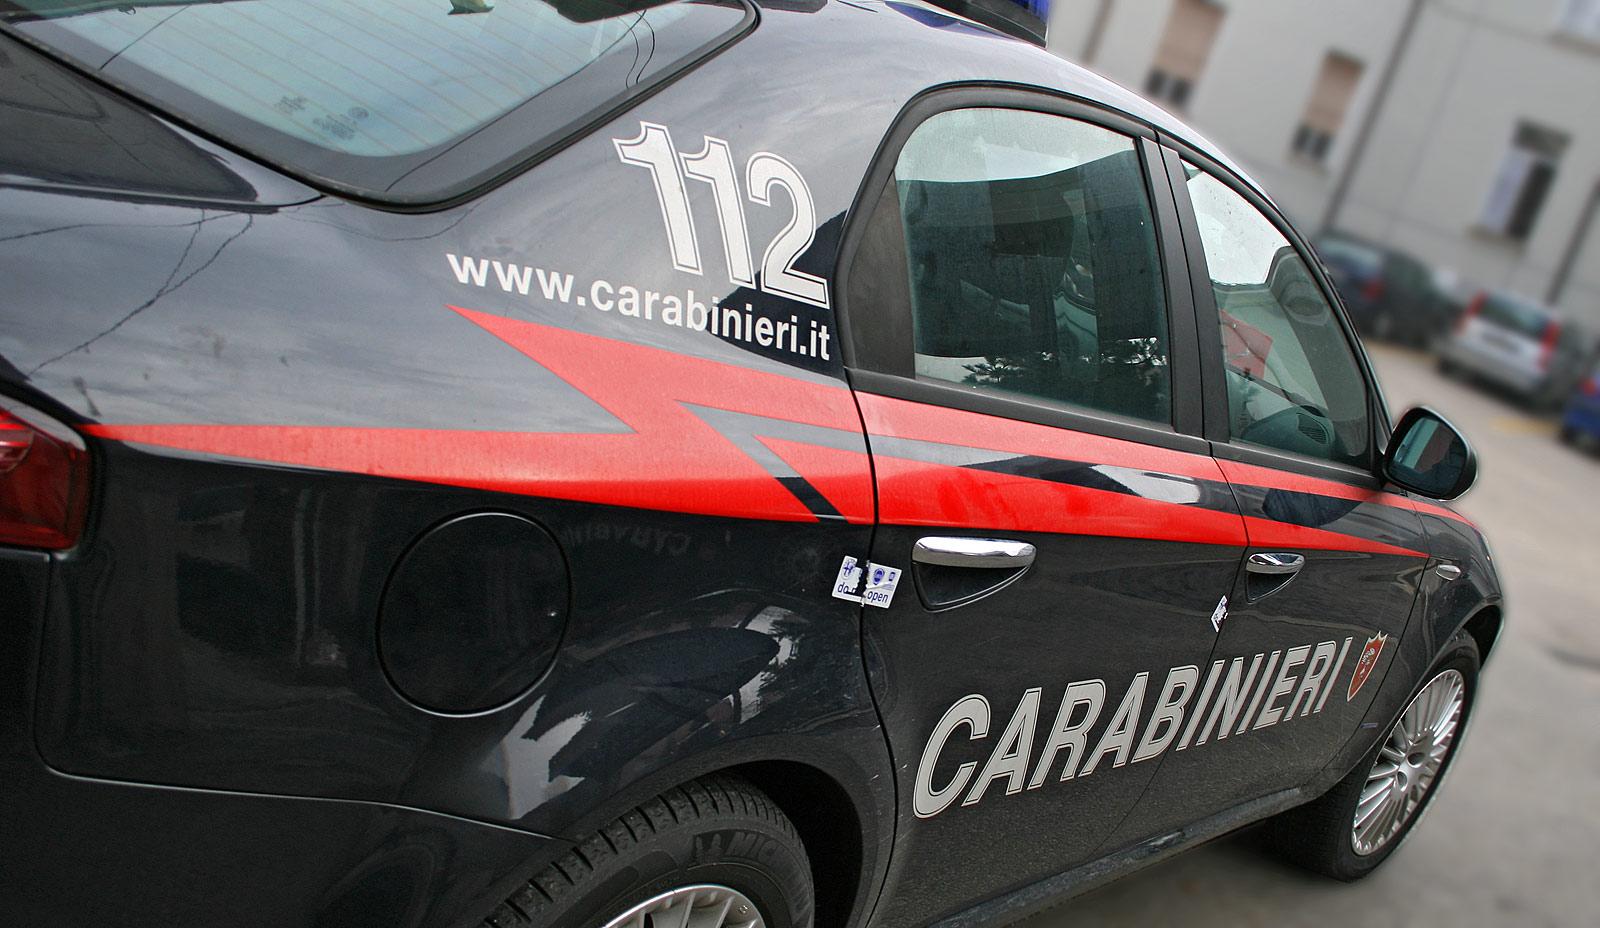 carabinieriauto1